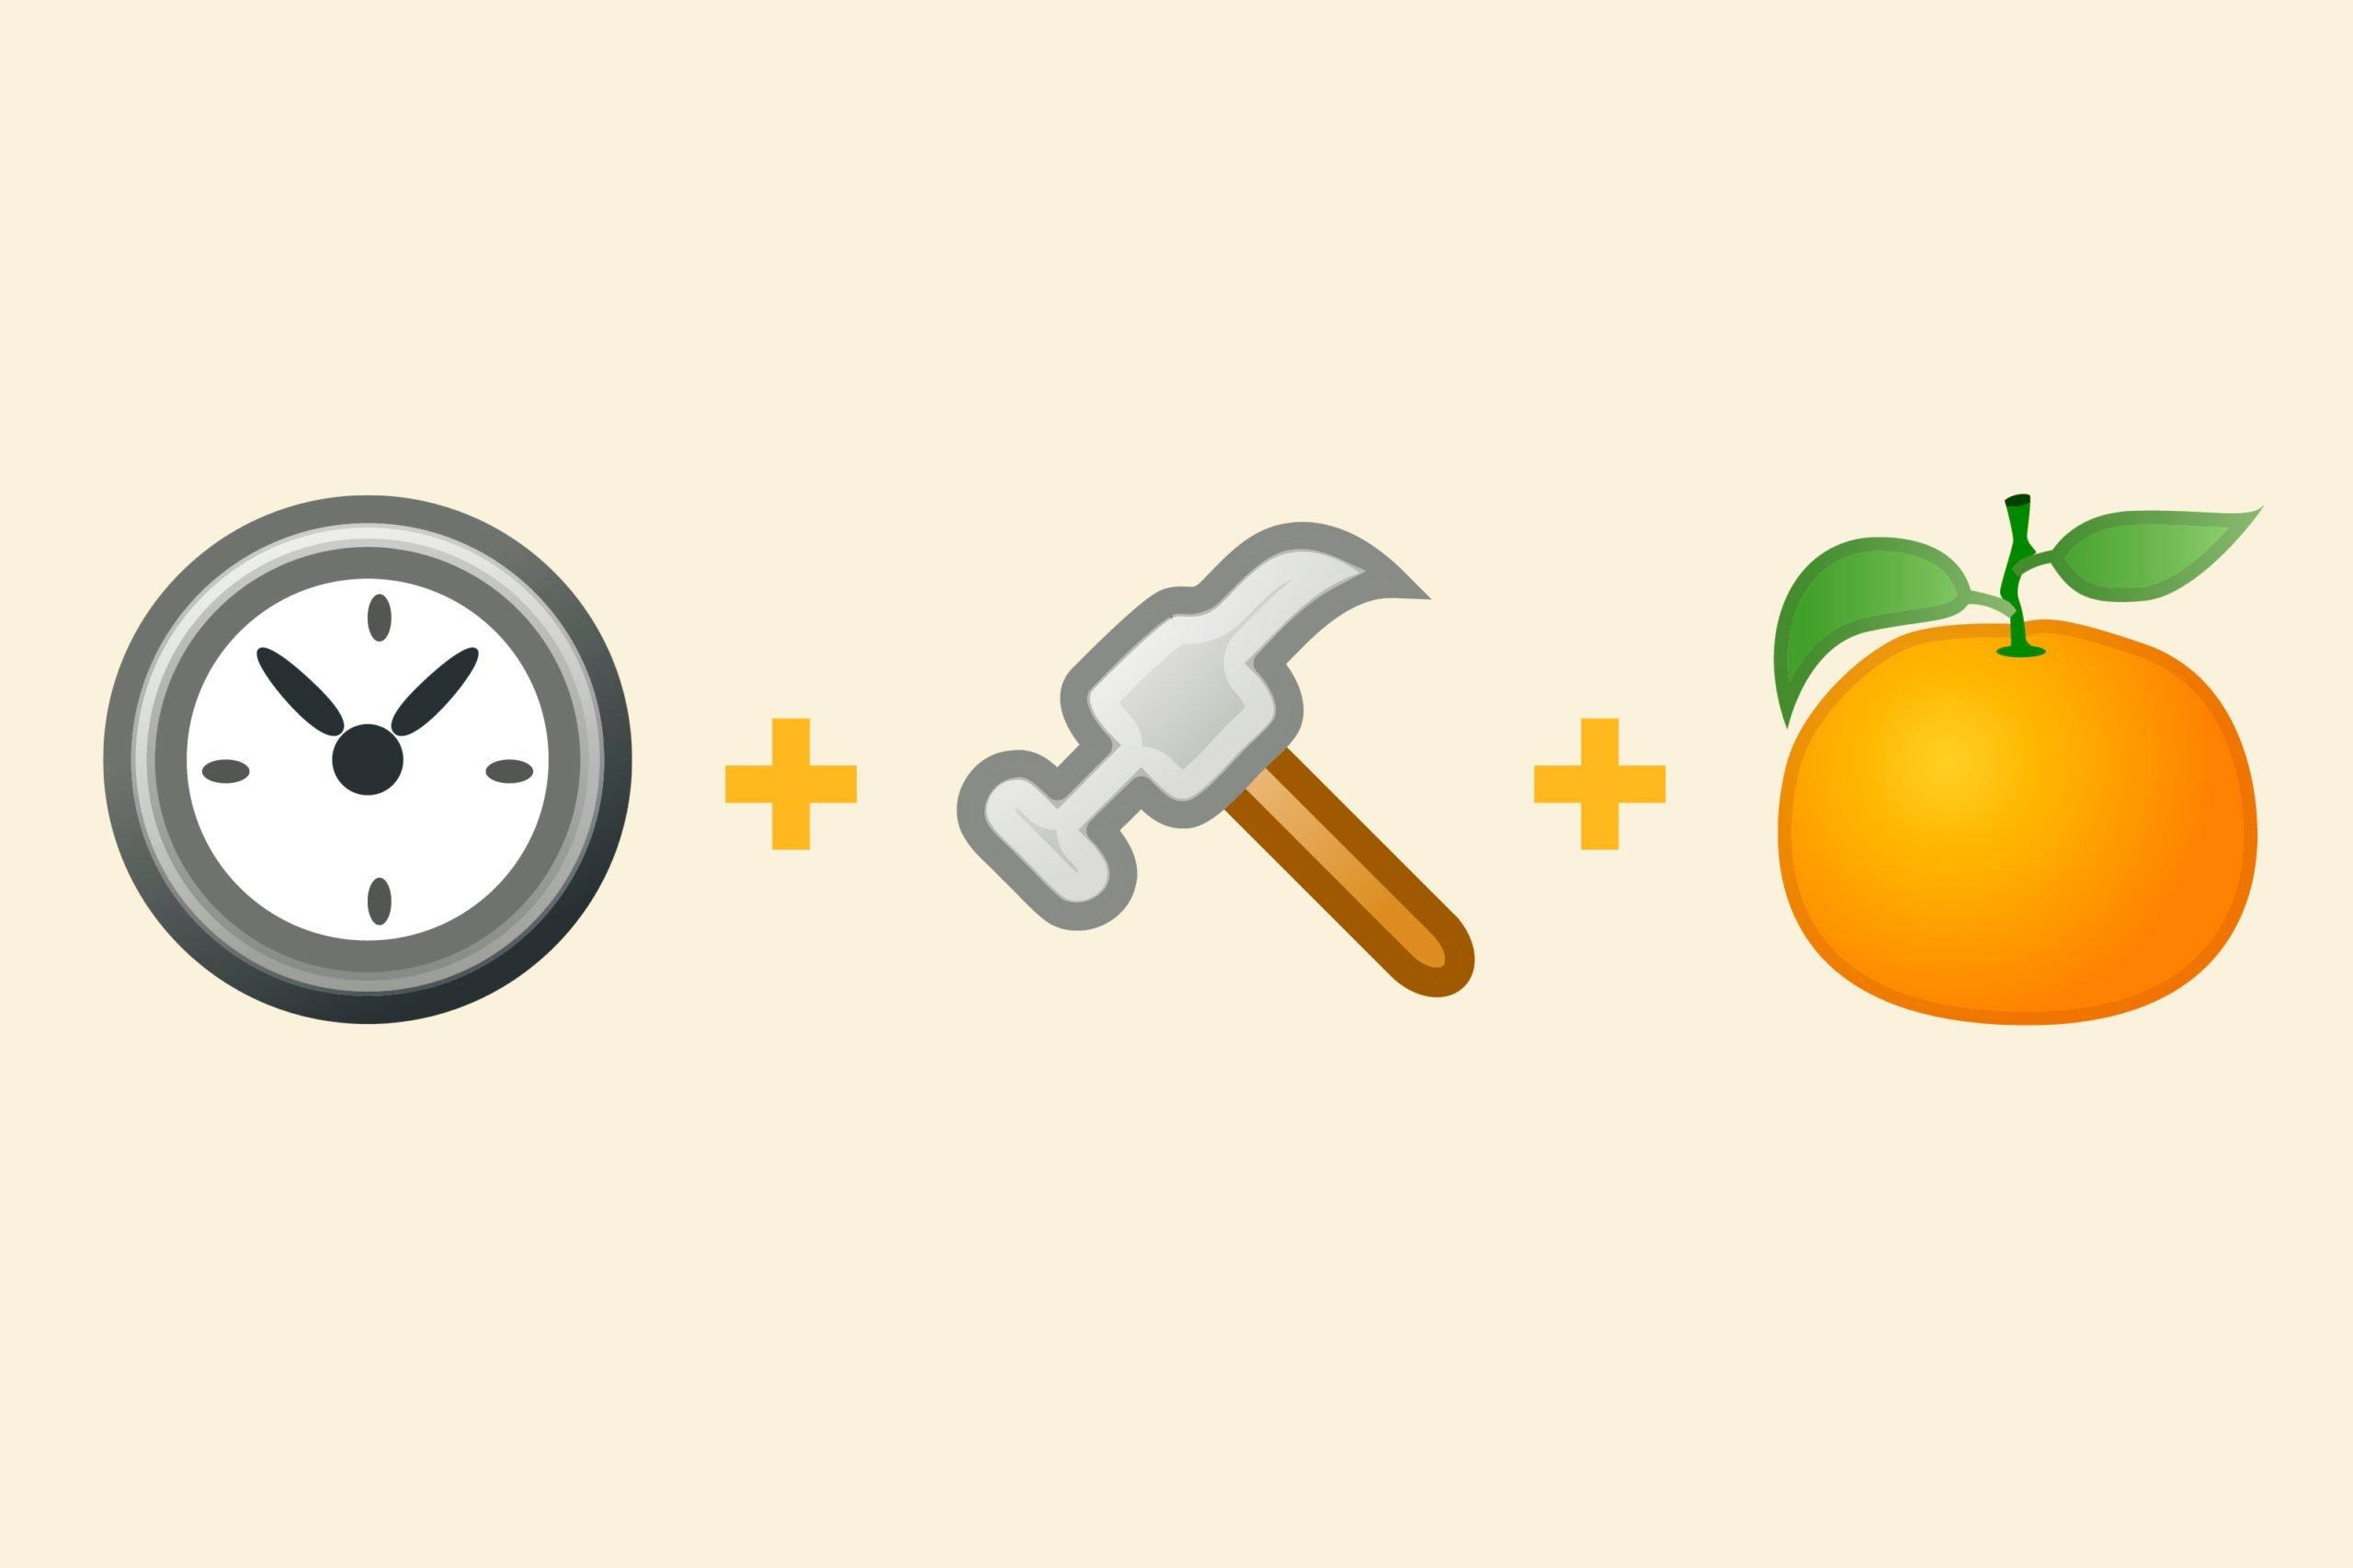 Clock emoji + hammer emoji + orange emoji